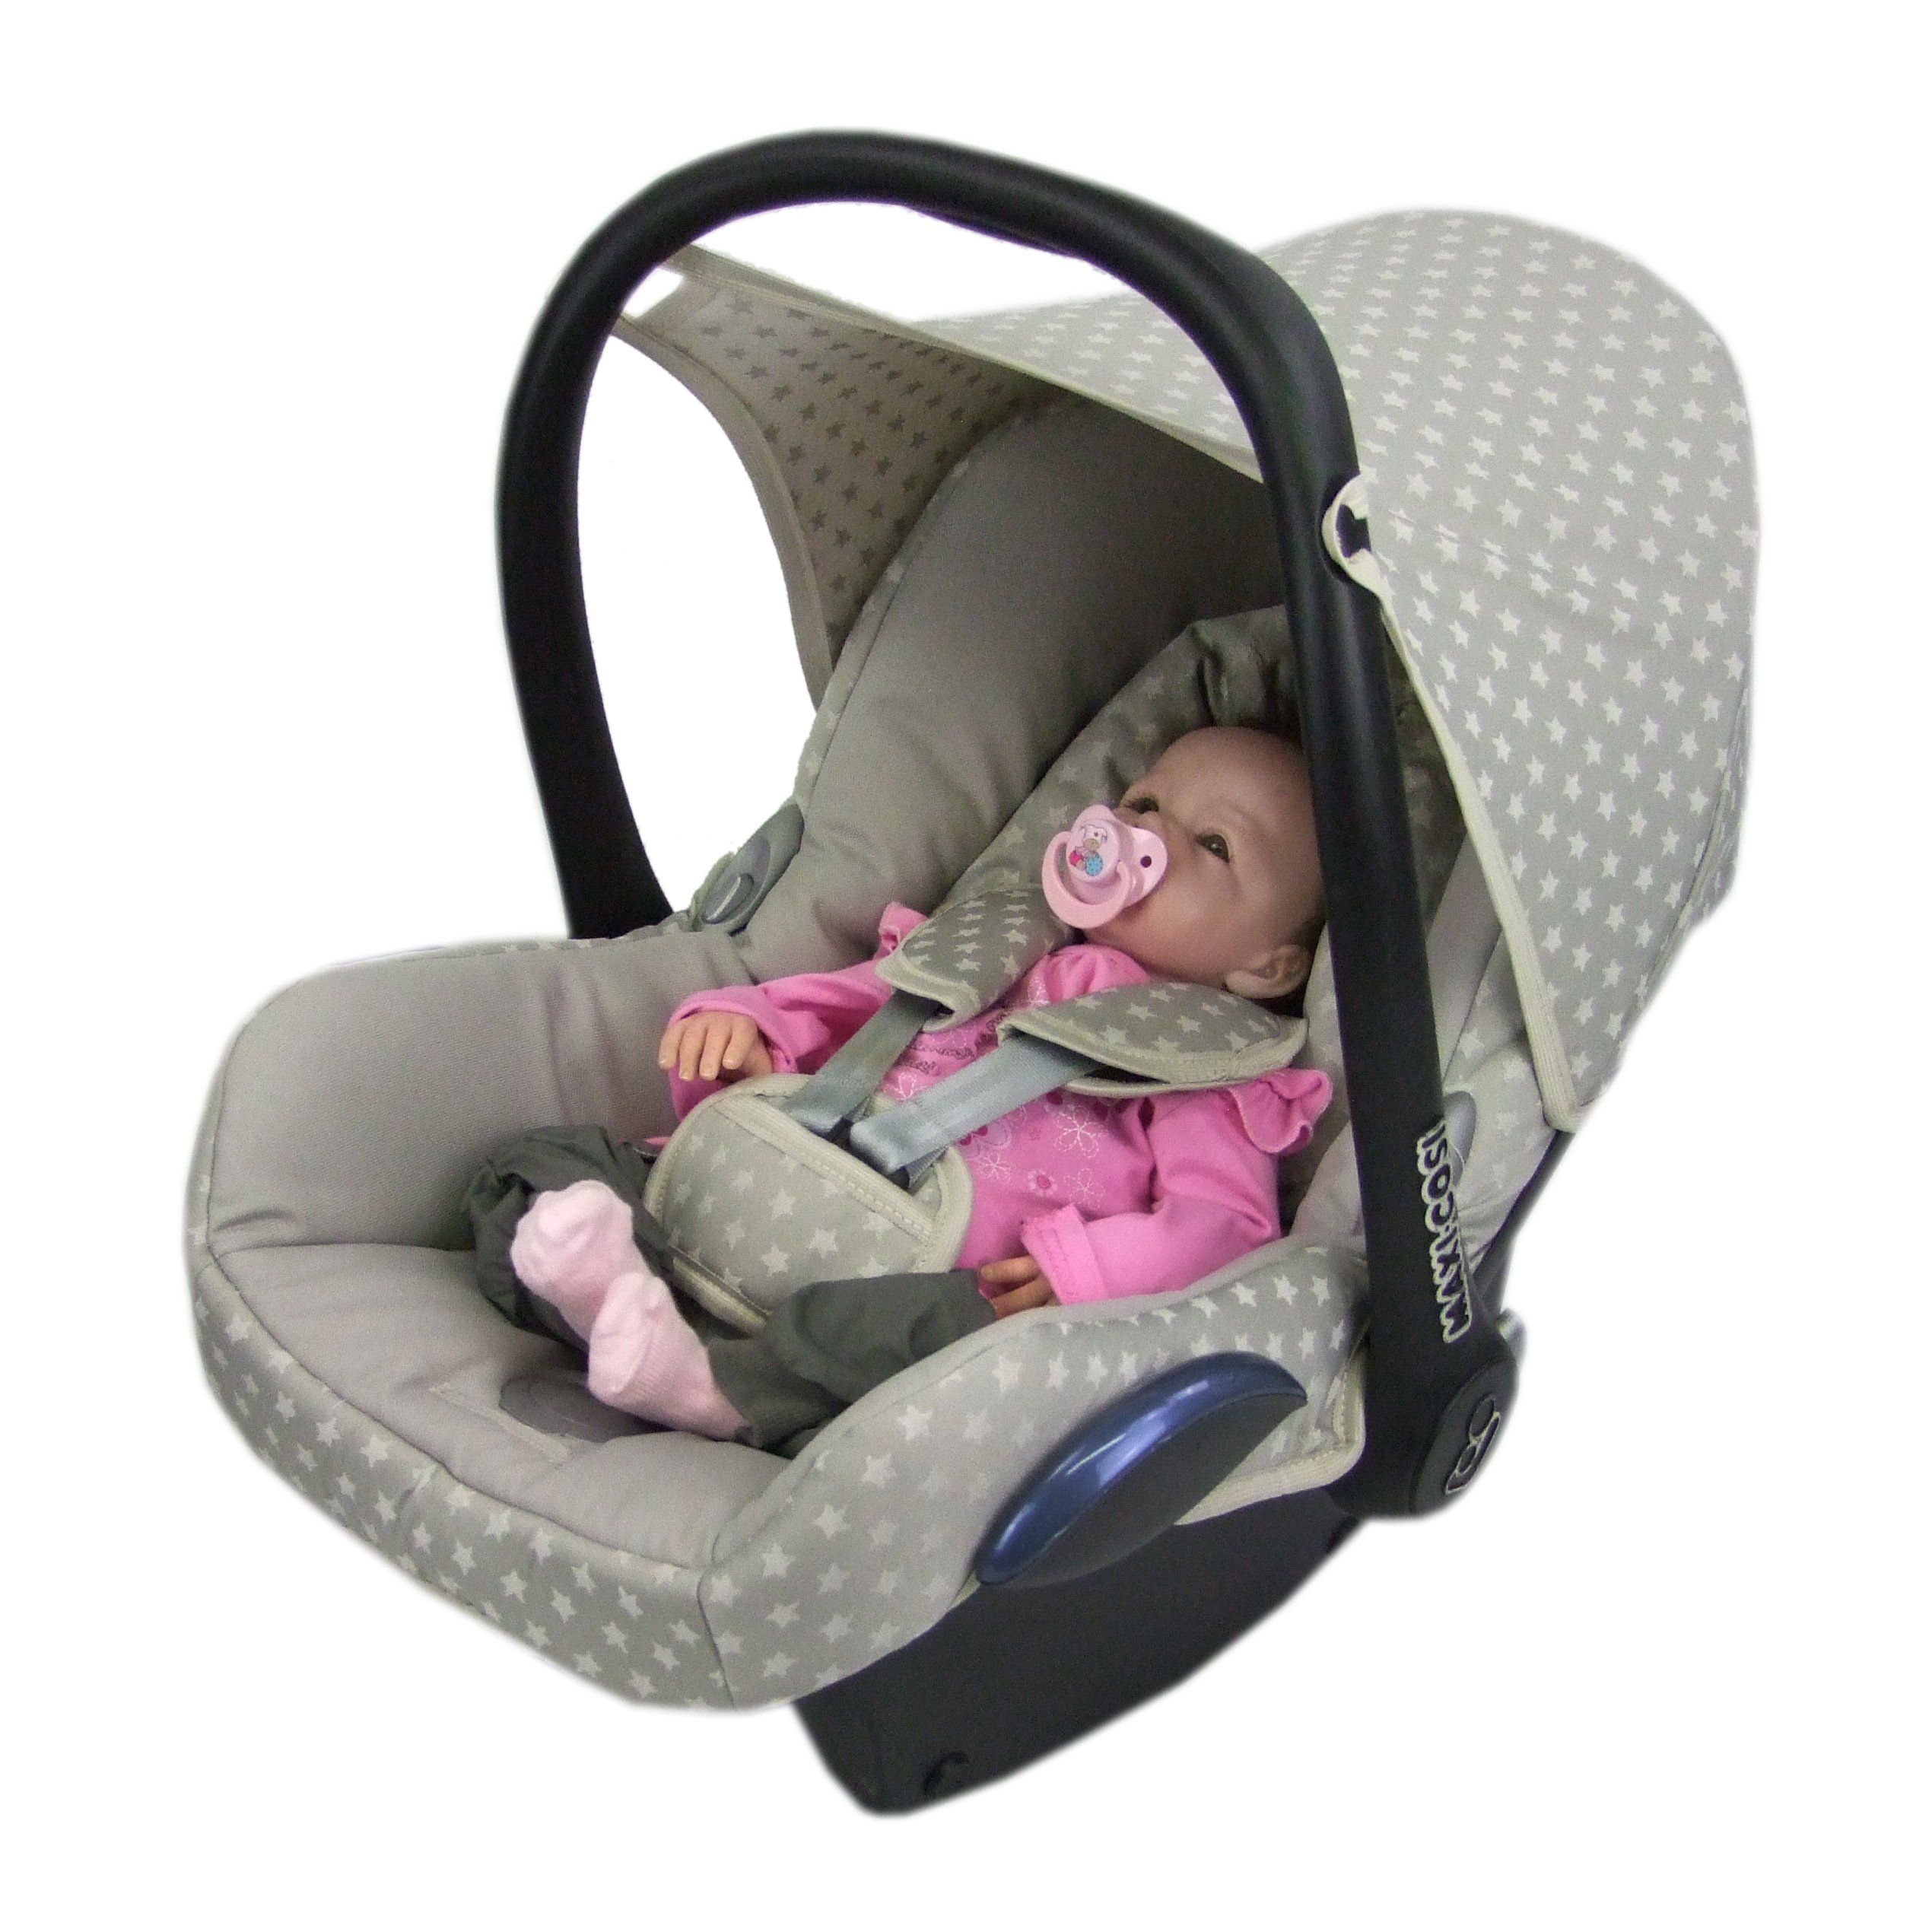 Bambiniwelt Ersatzbezug F R Maxi Cosi Cabriofix 6 Tlg Bezug F R Babyschale Komplett Set Sterne Beige Neu In 2020 Baby Car Seats Car Seats Baby Car